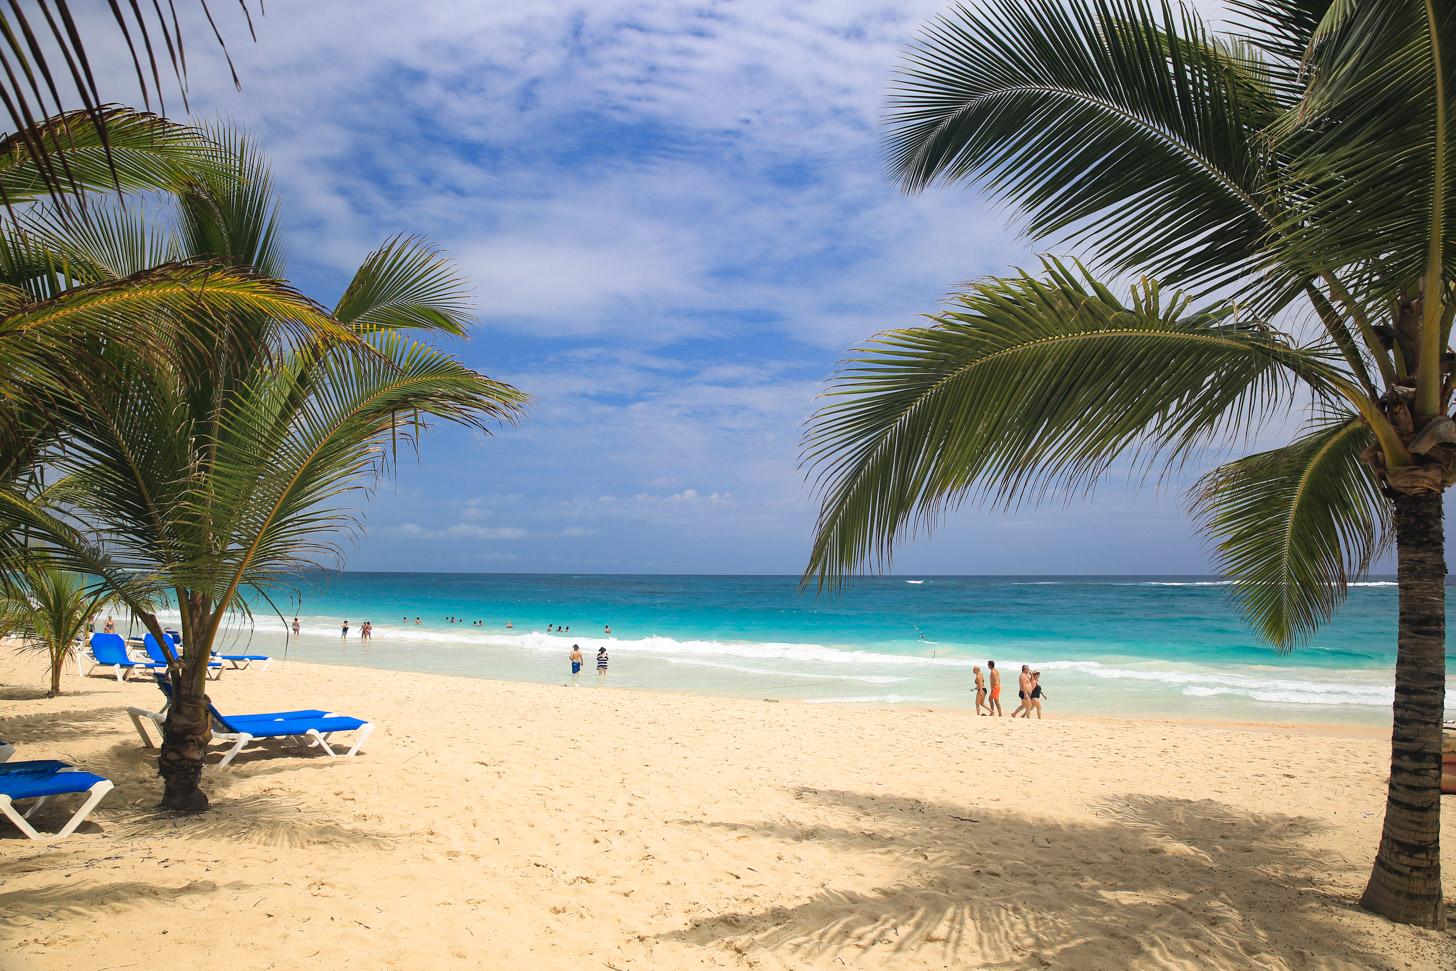 Het strand van Punta Cana